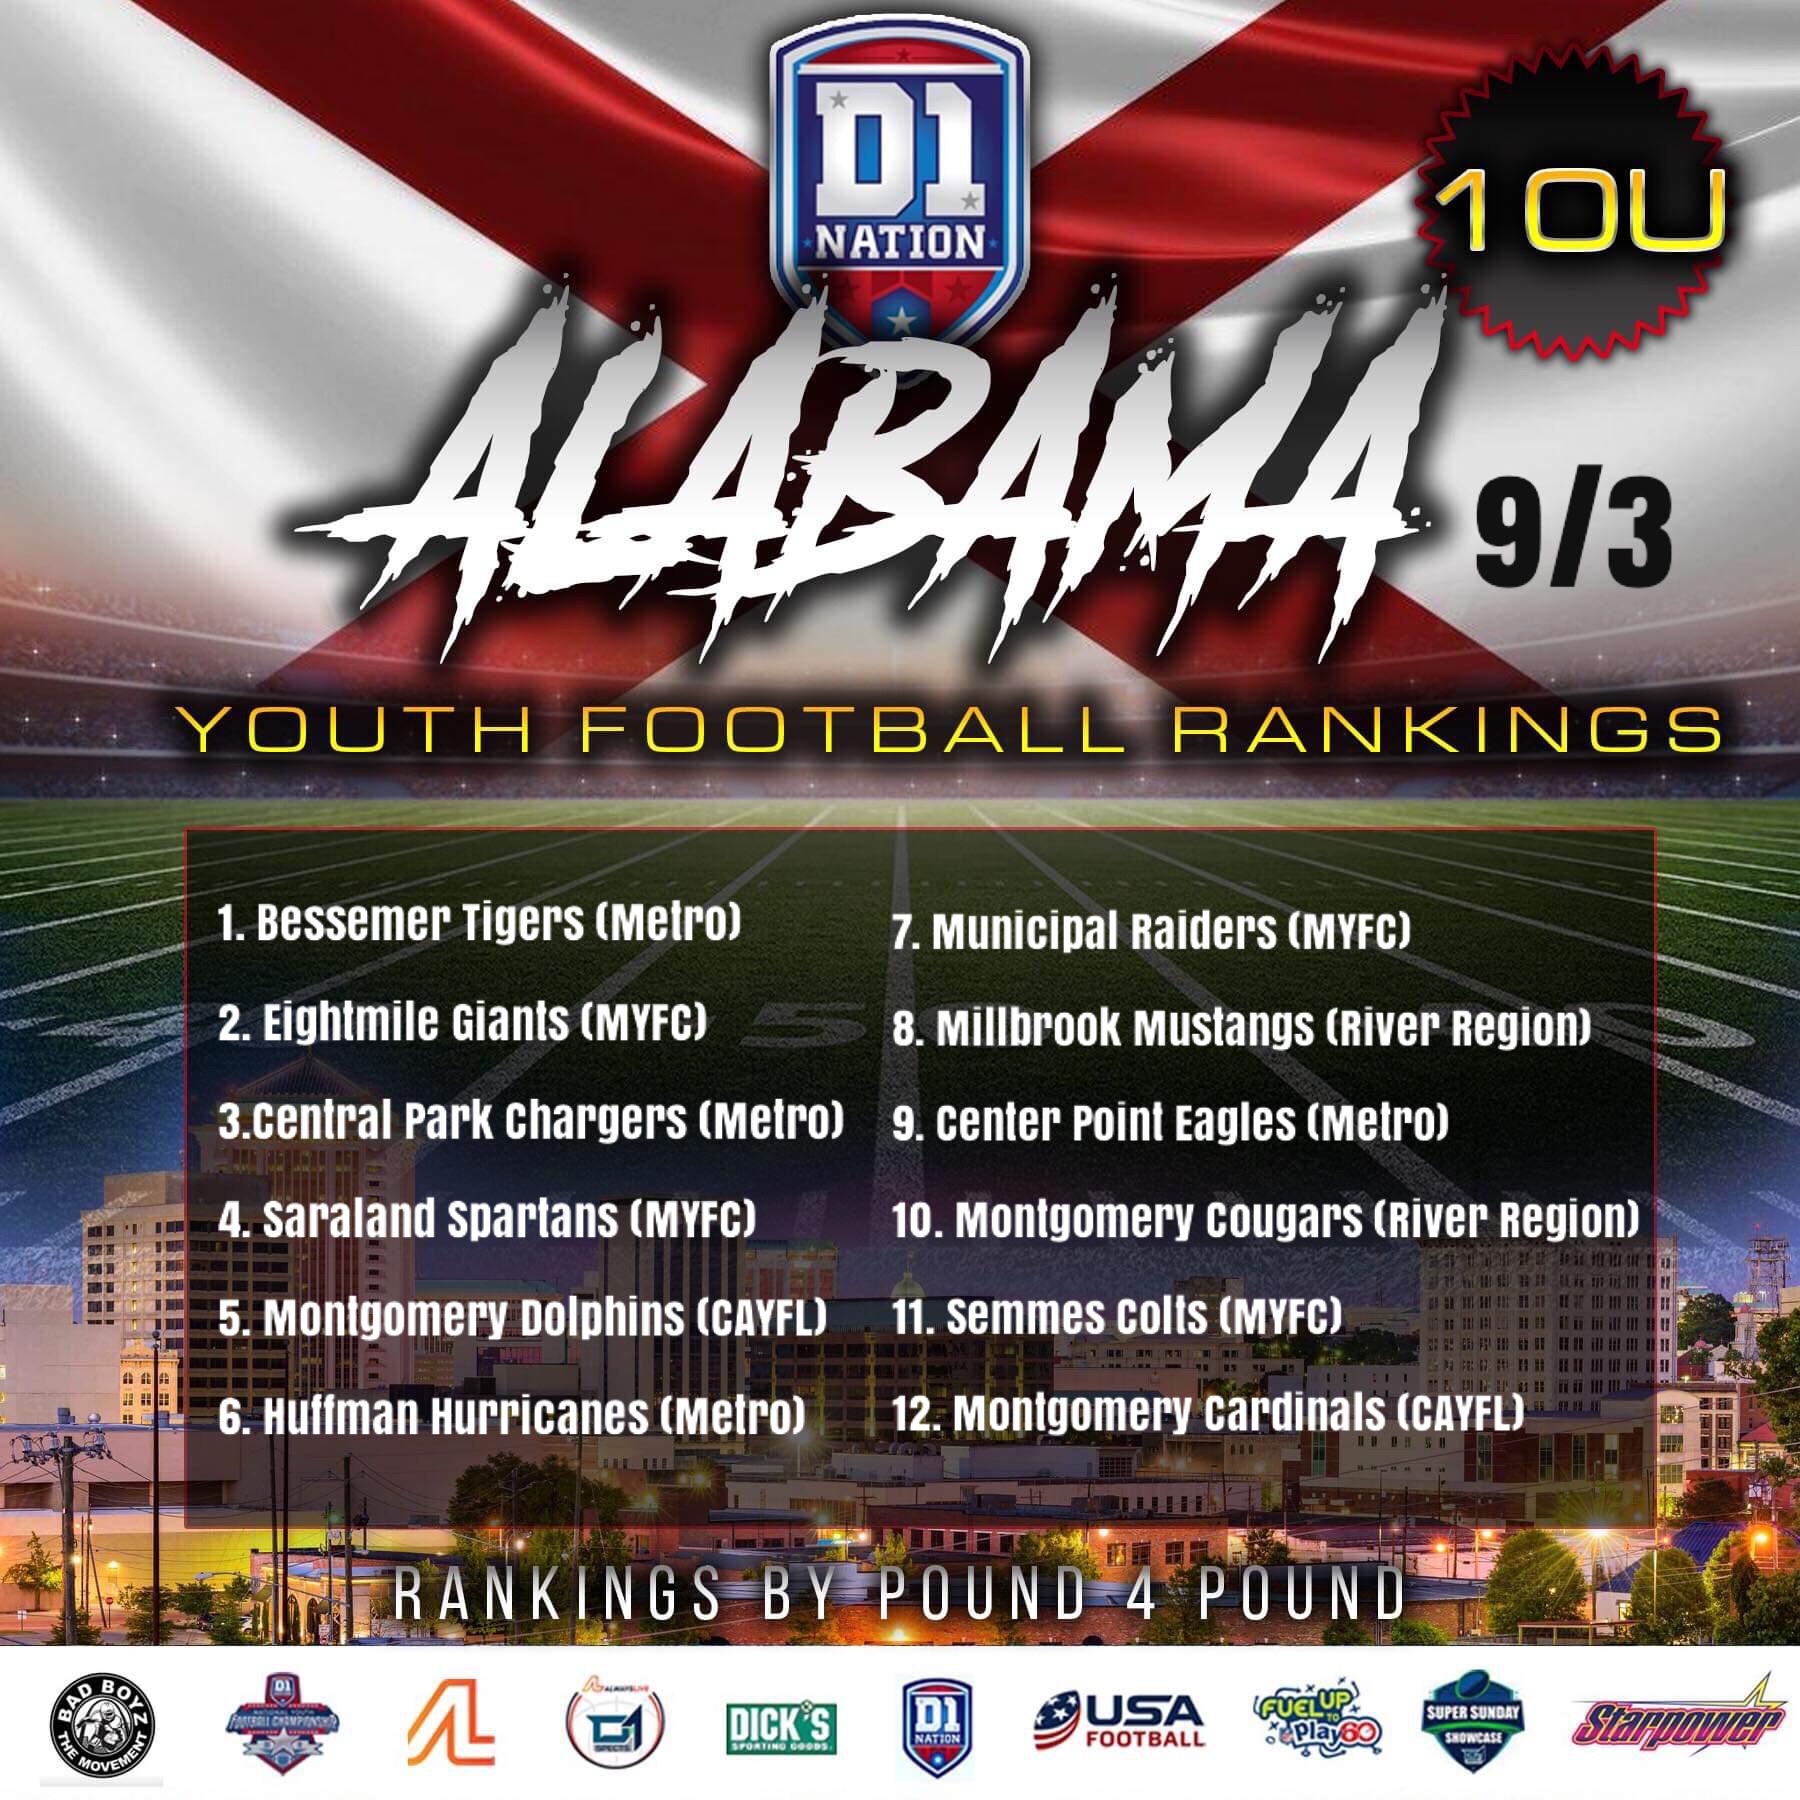 UPDATE 9/3/2019: Alabama Youth Football Rankings – 10U